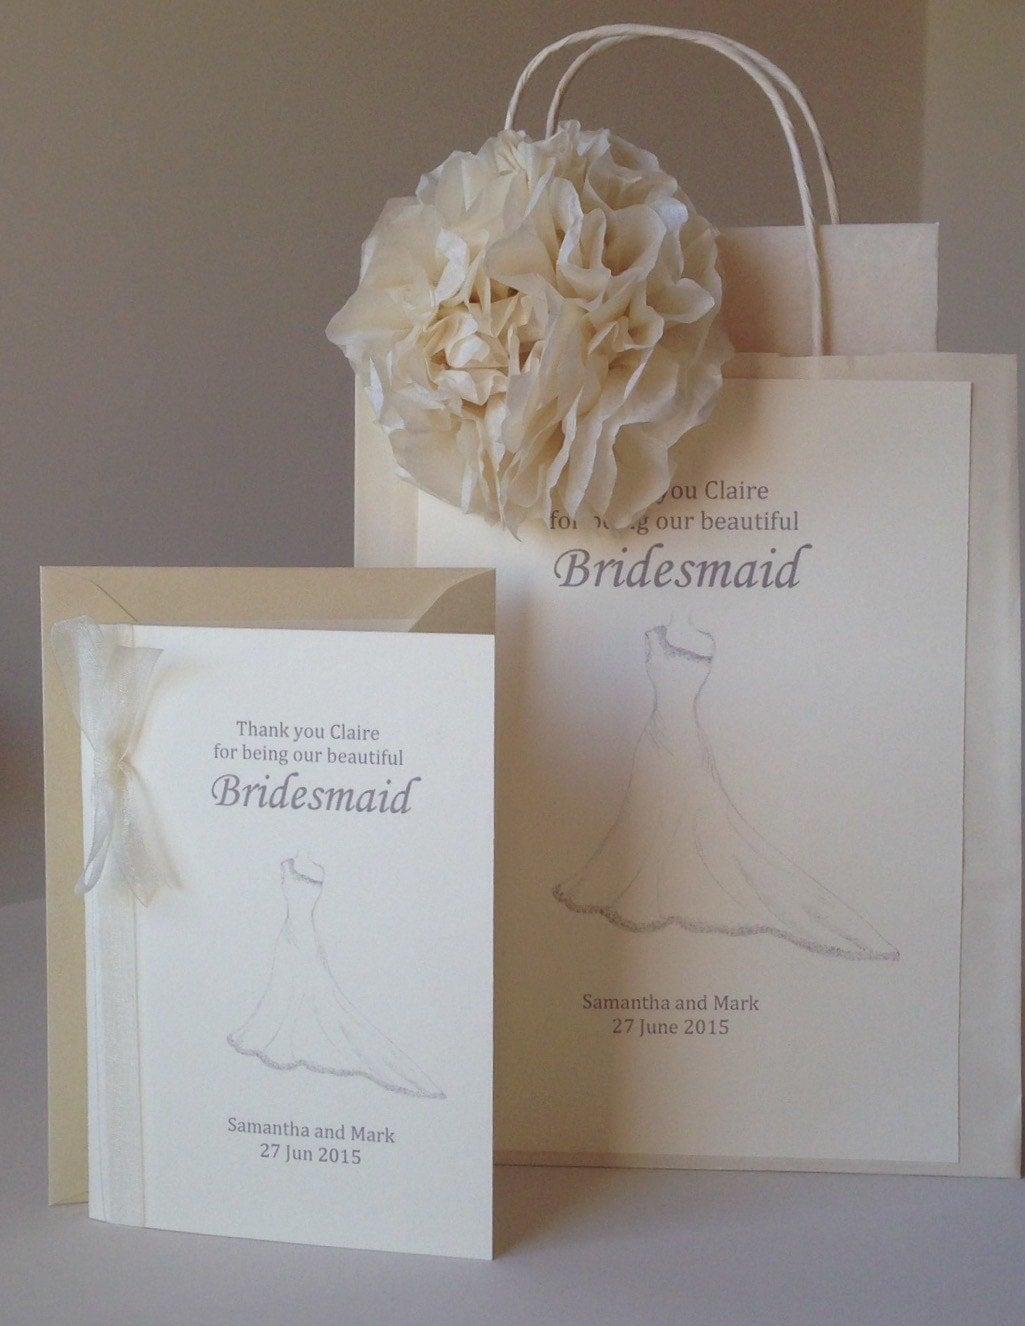 Wedding Gift Thank You Cards Uk : Wedding Gift Bag & Matching Thank You Card For Bridesmaid /